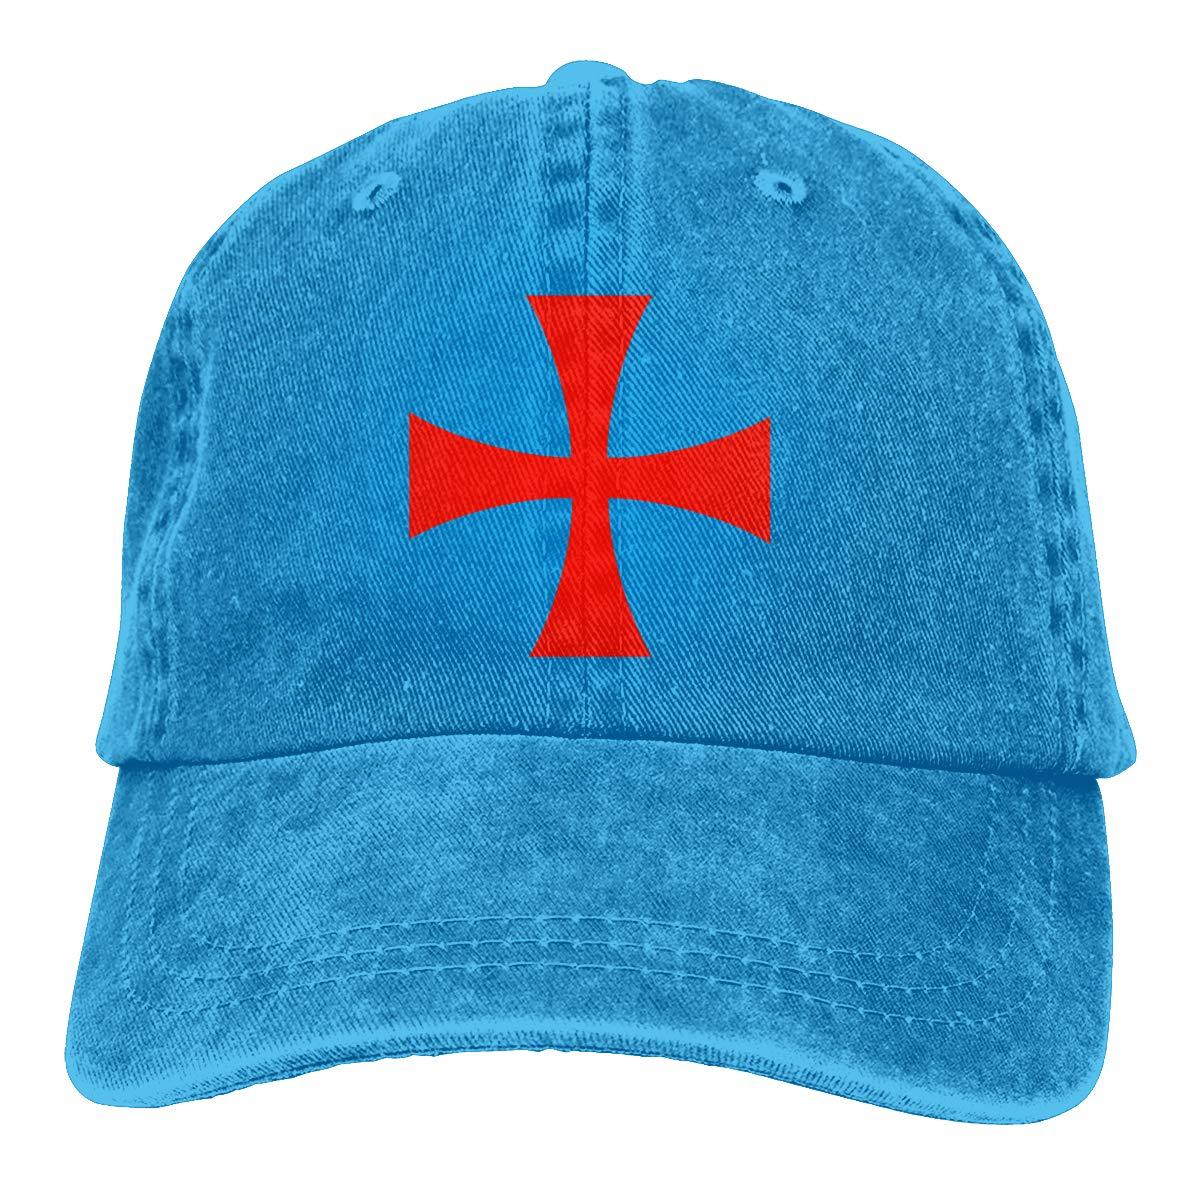 Sajfirlug Templar Knight Symbol Fashion Adjustable Cowboy Cap Denim Hat for Women and Men